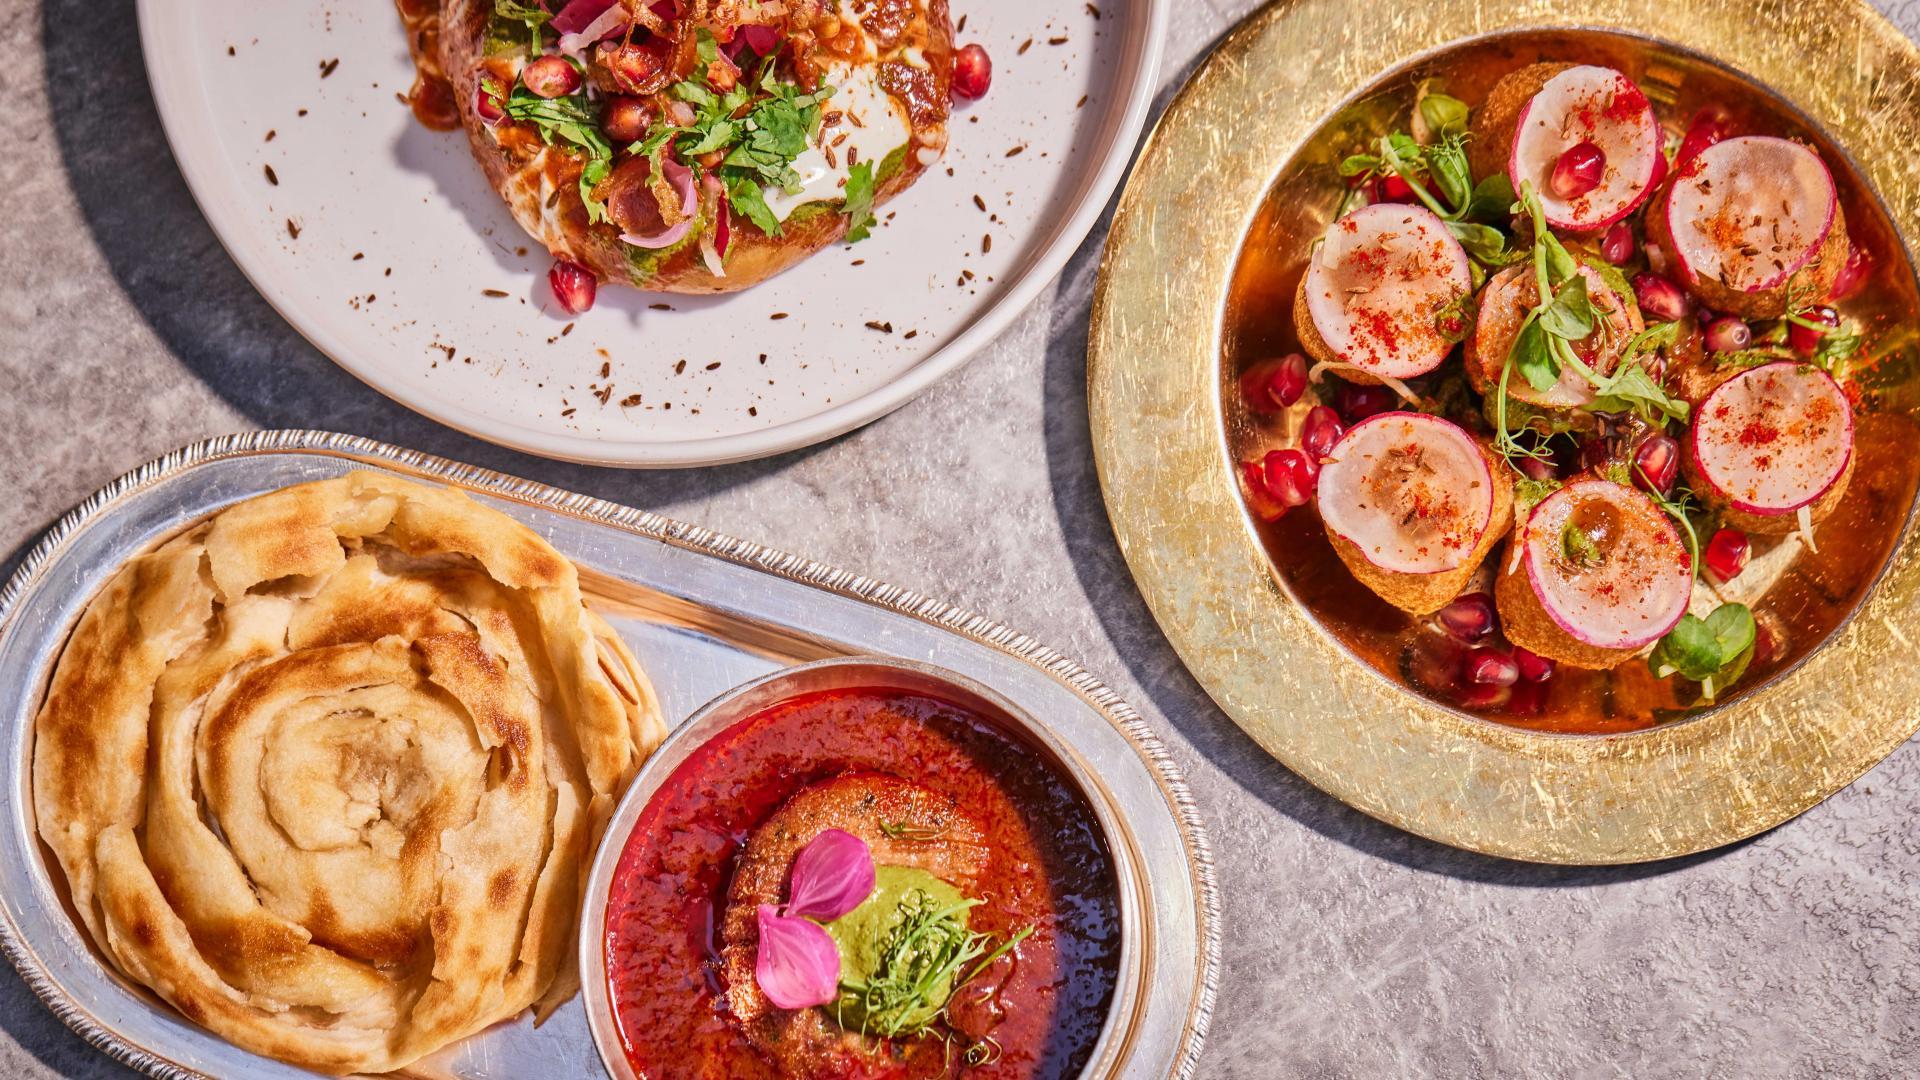 New London restaurants: Manthan by Rohit Ghai